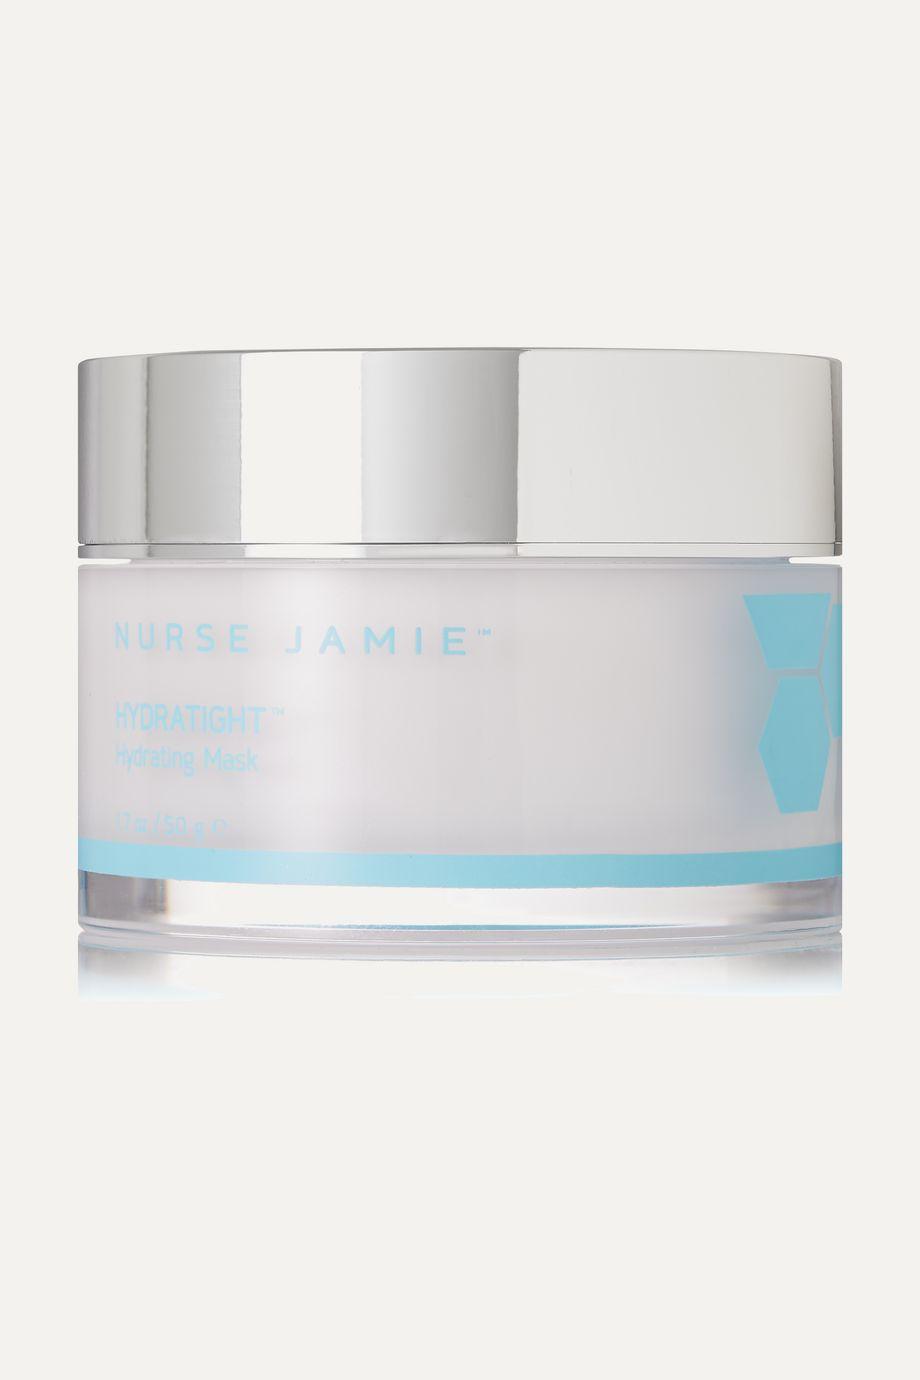 Nurse Jamie HydraTight™ Hydrating Mask, 50 g – Gesichtsmaske